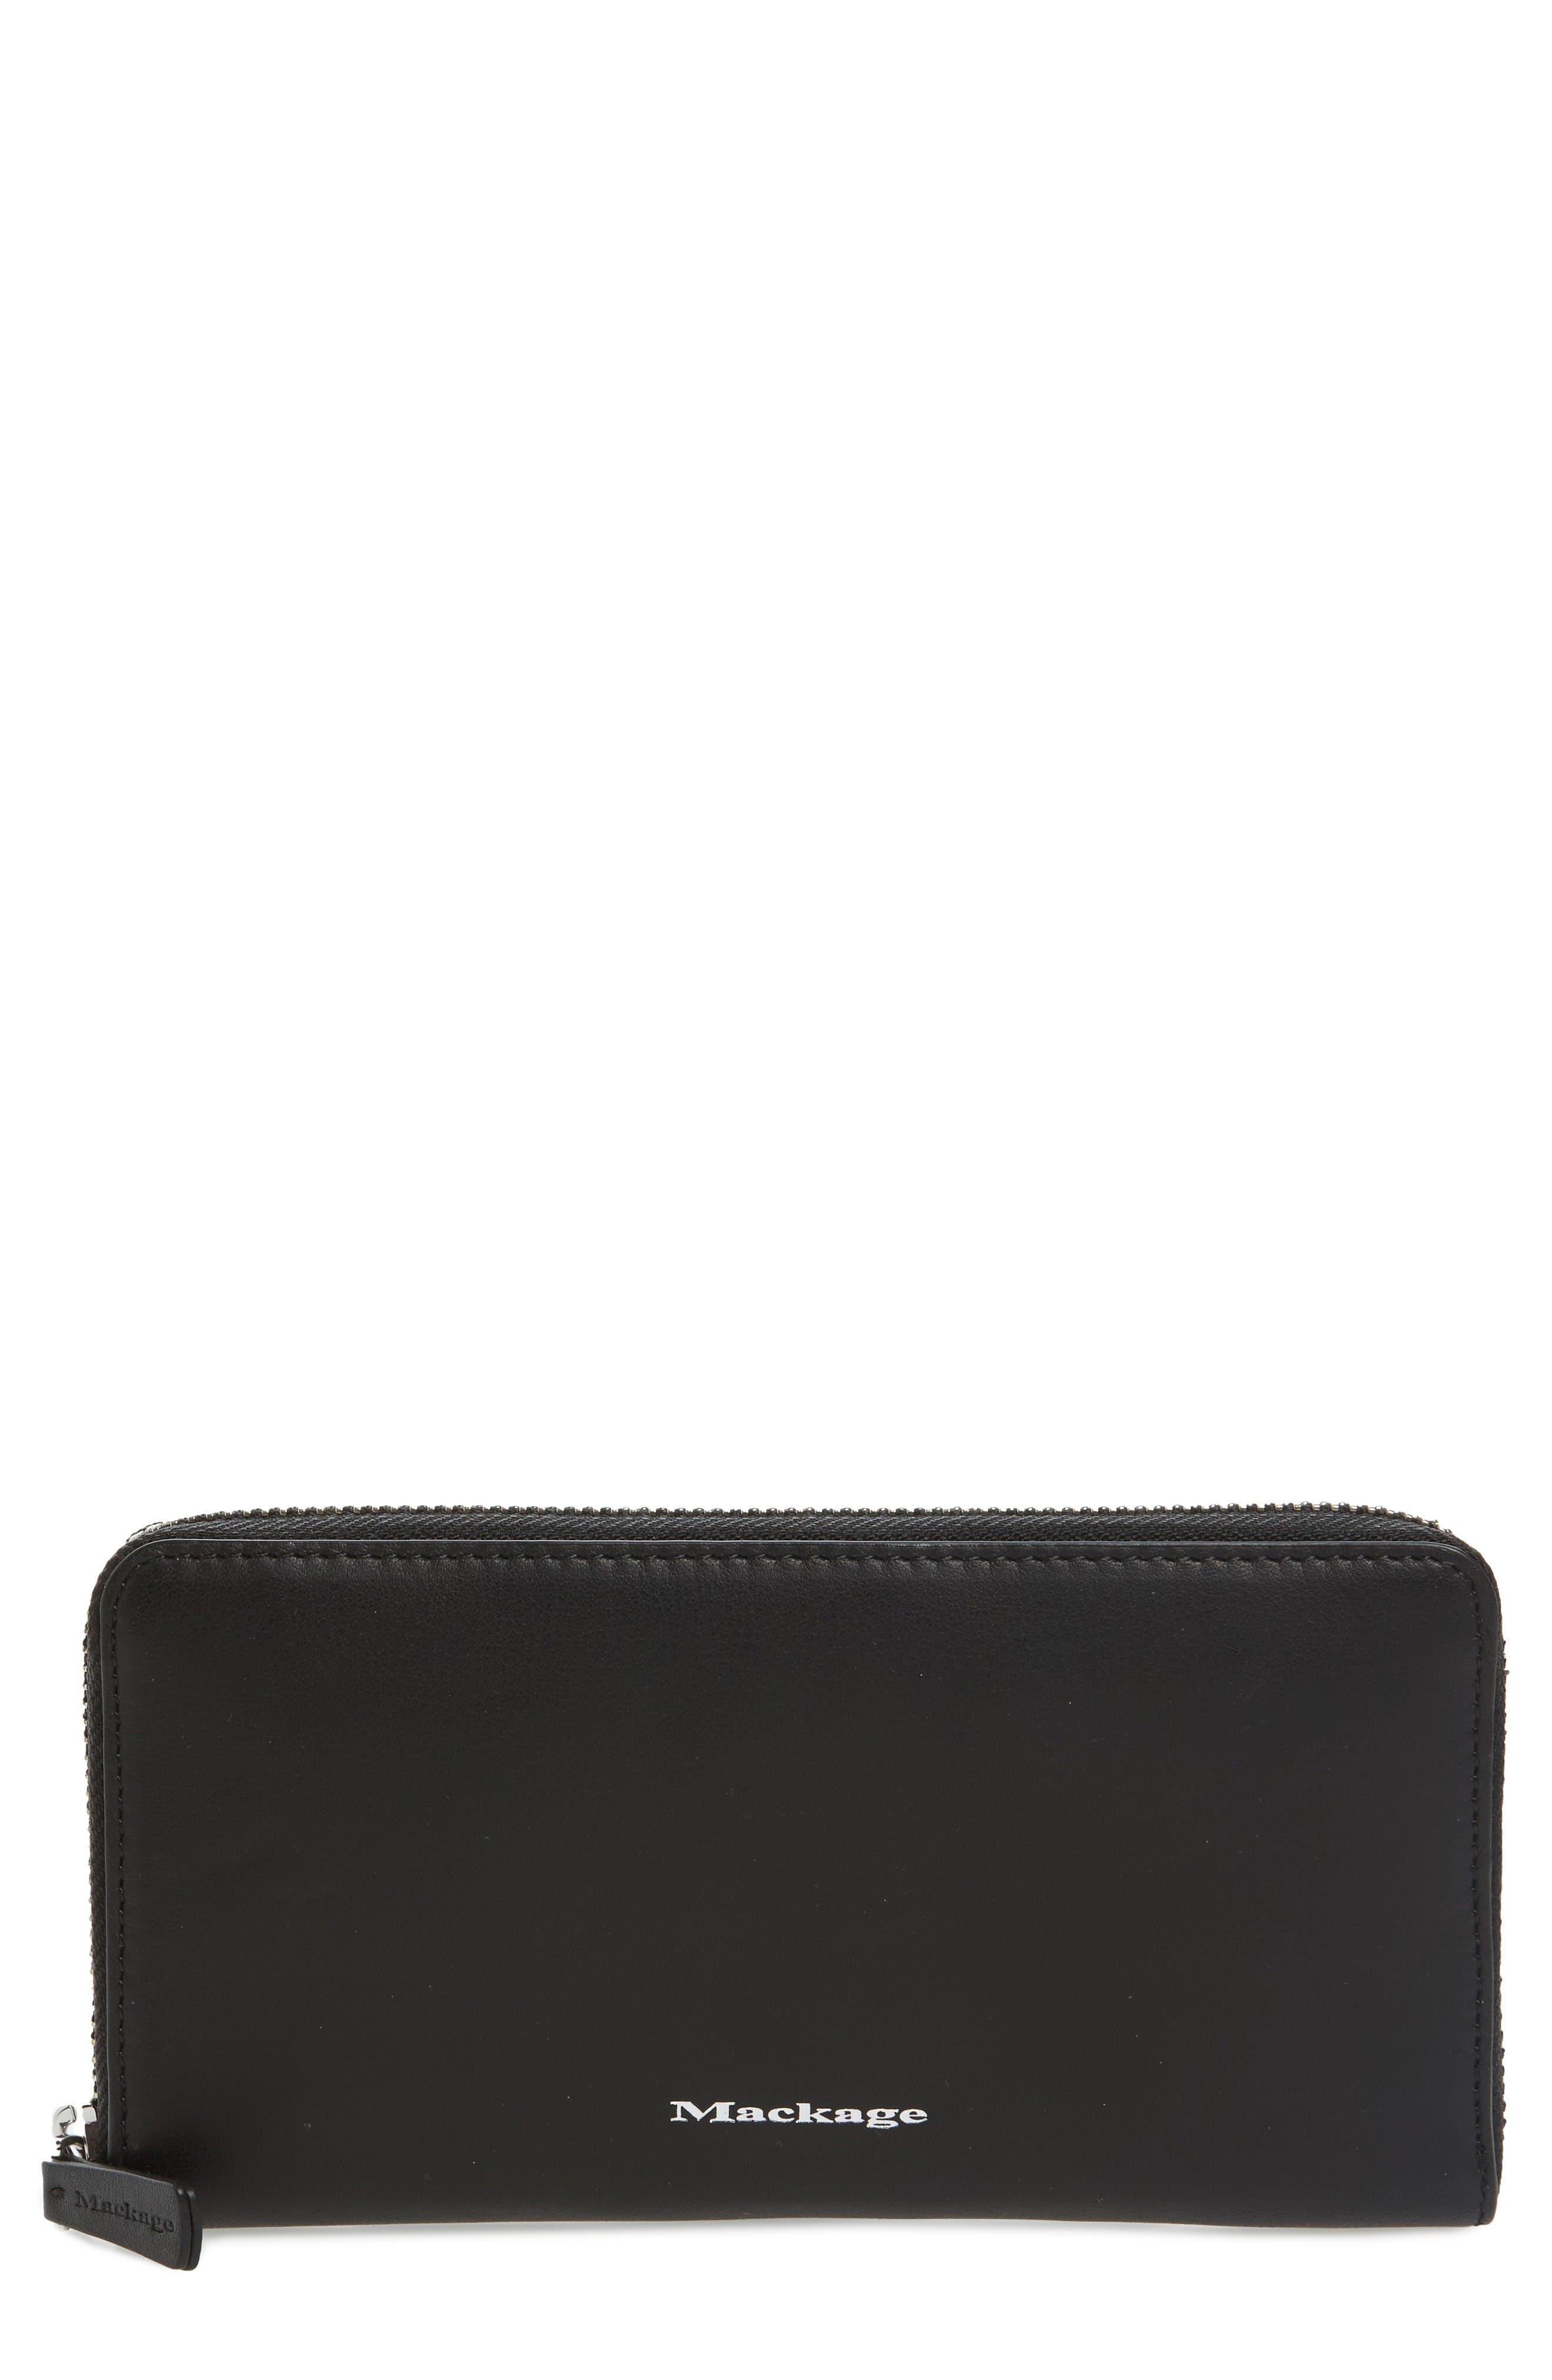 Mackage Duke Zip Around Leather Wallet